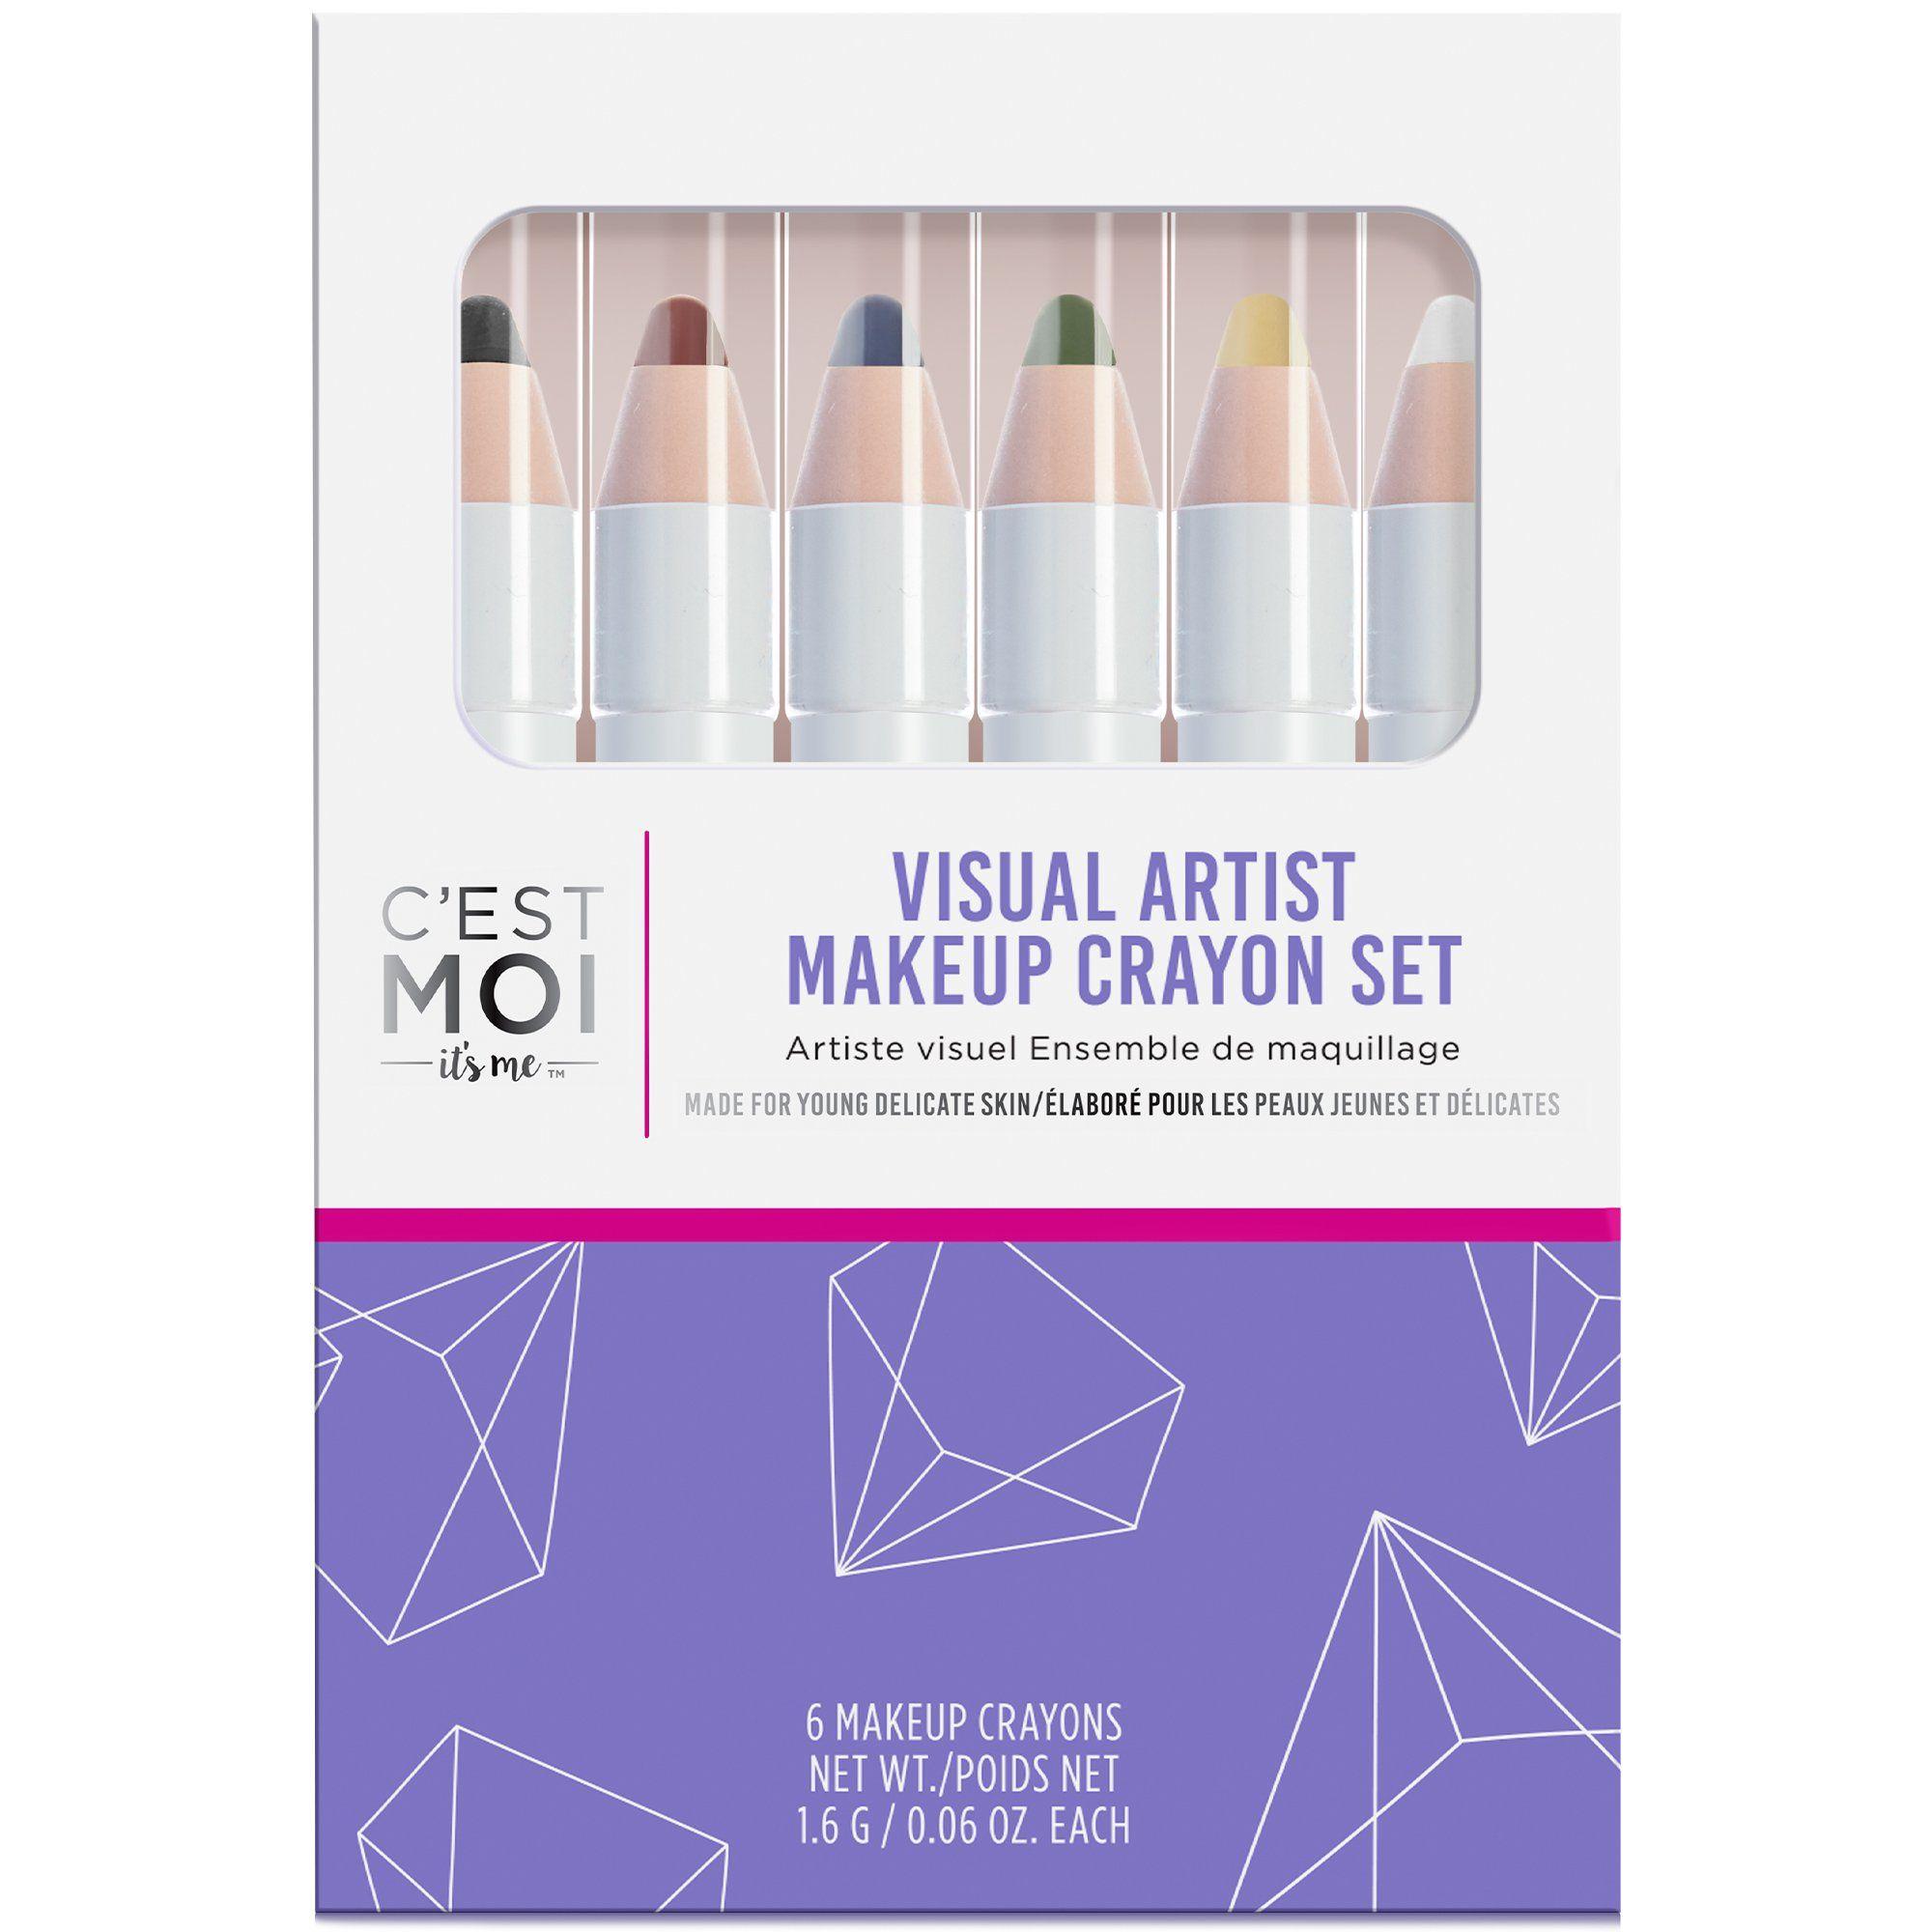 Visual Artist Makeup Crayon Set Gentle makeup remover